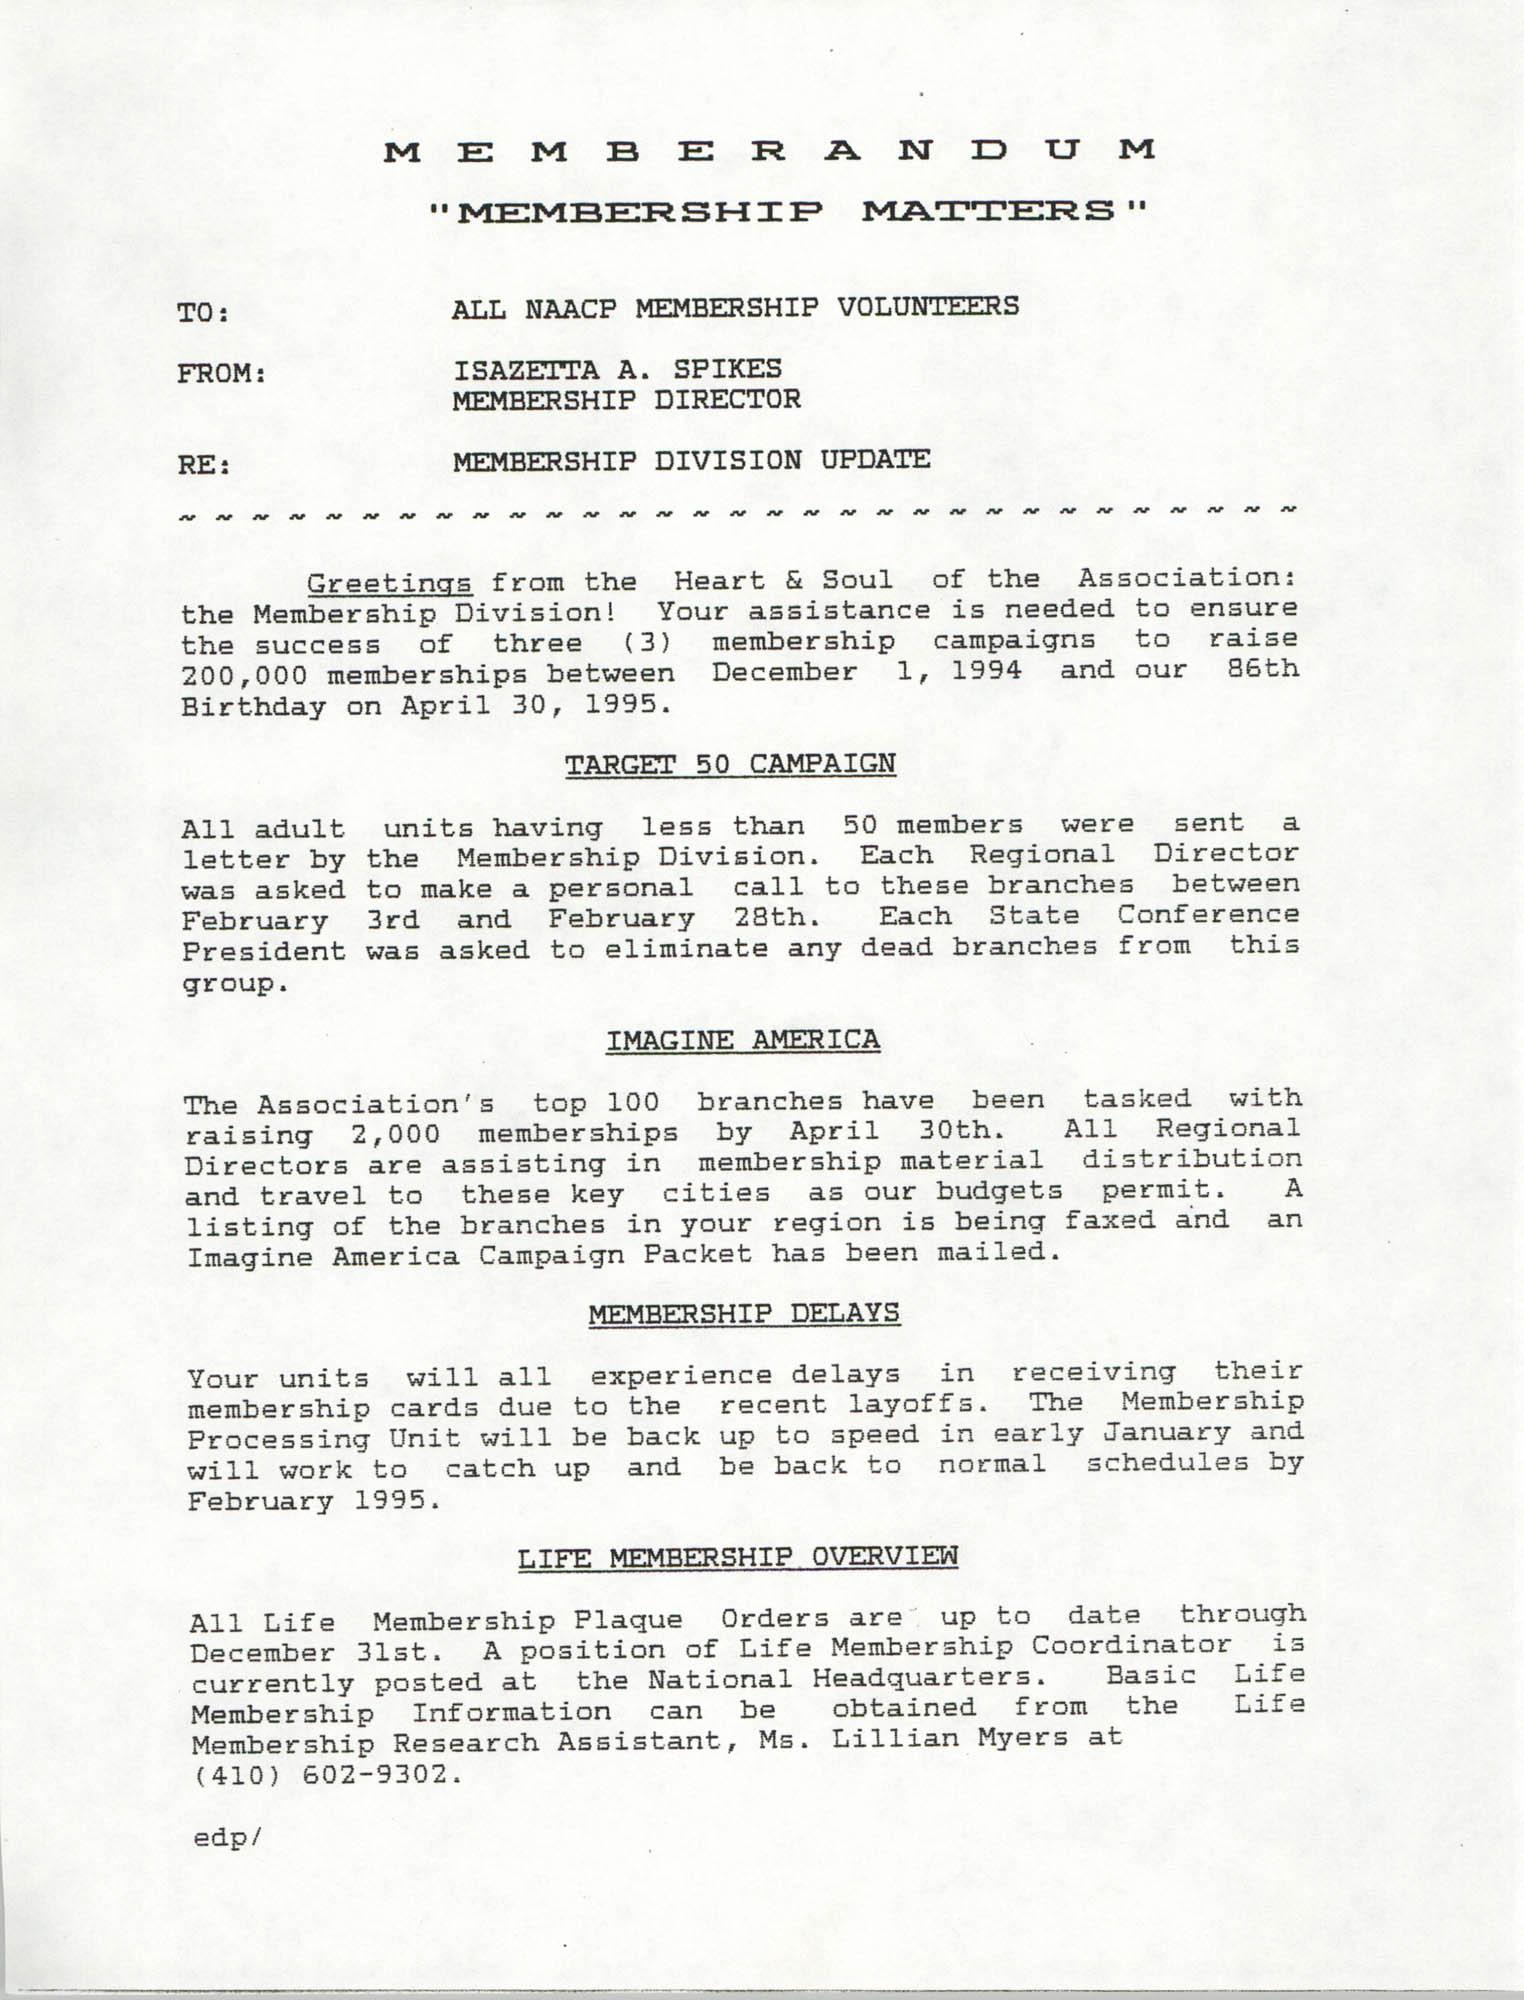 Memorandum, Isazetta A. Spikes